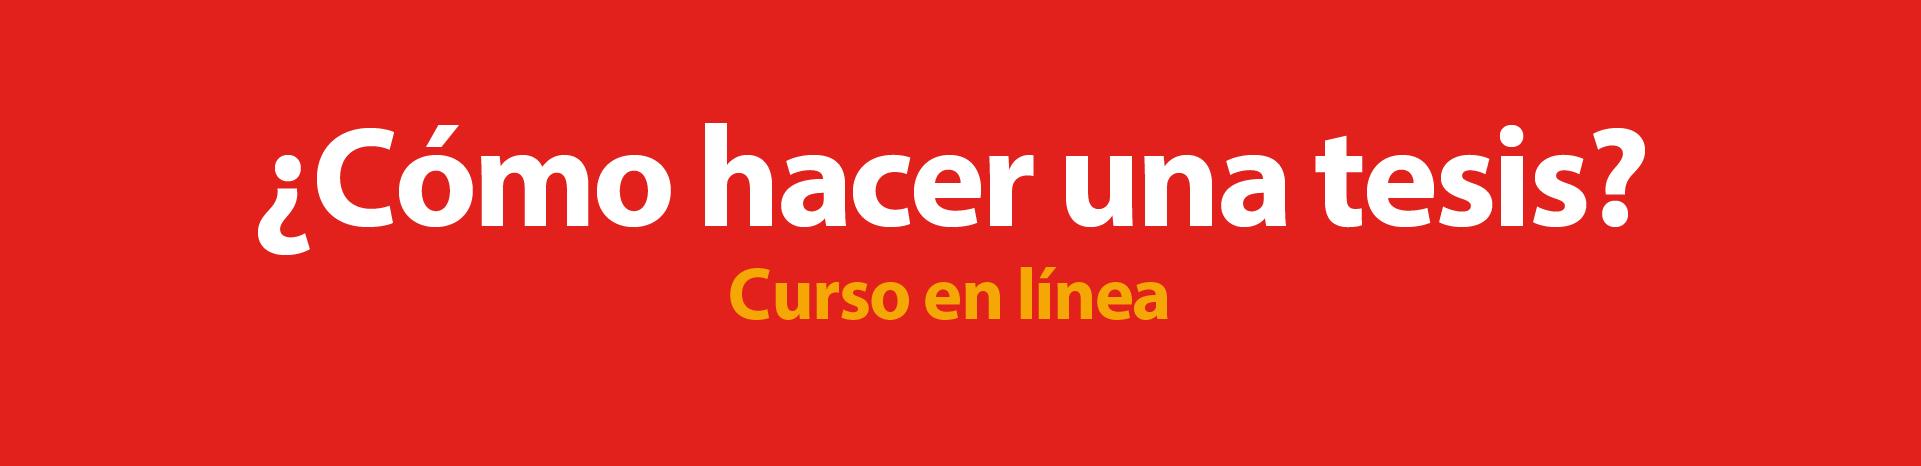 BANNER_WEB_DOCTORADO_TESIS_50A_UFM (3)